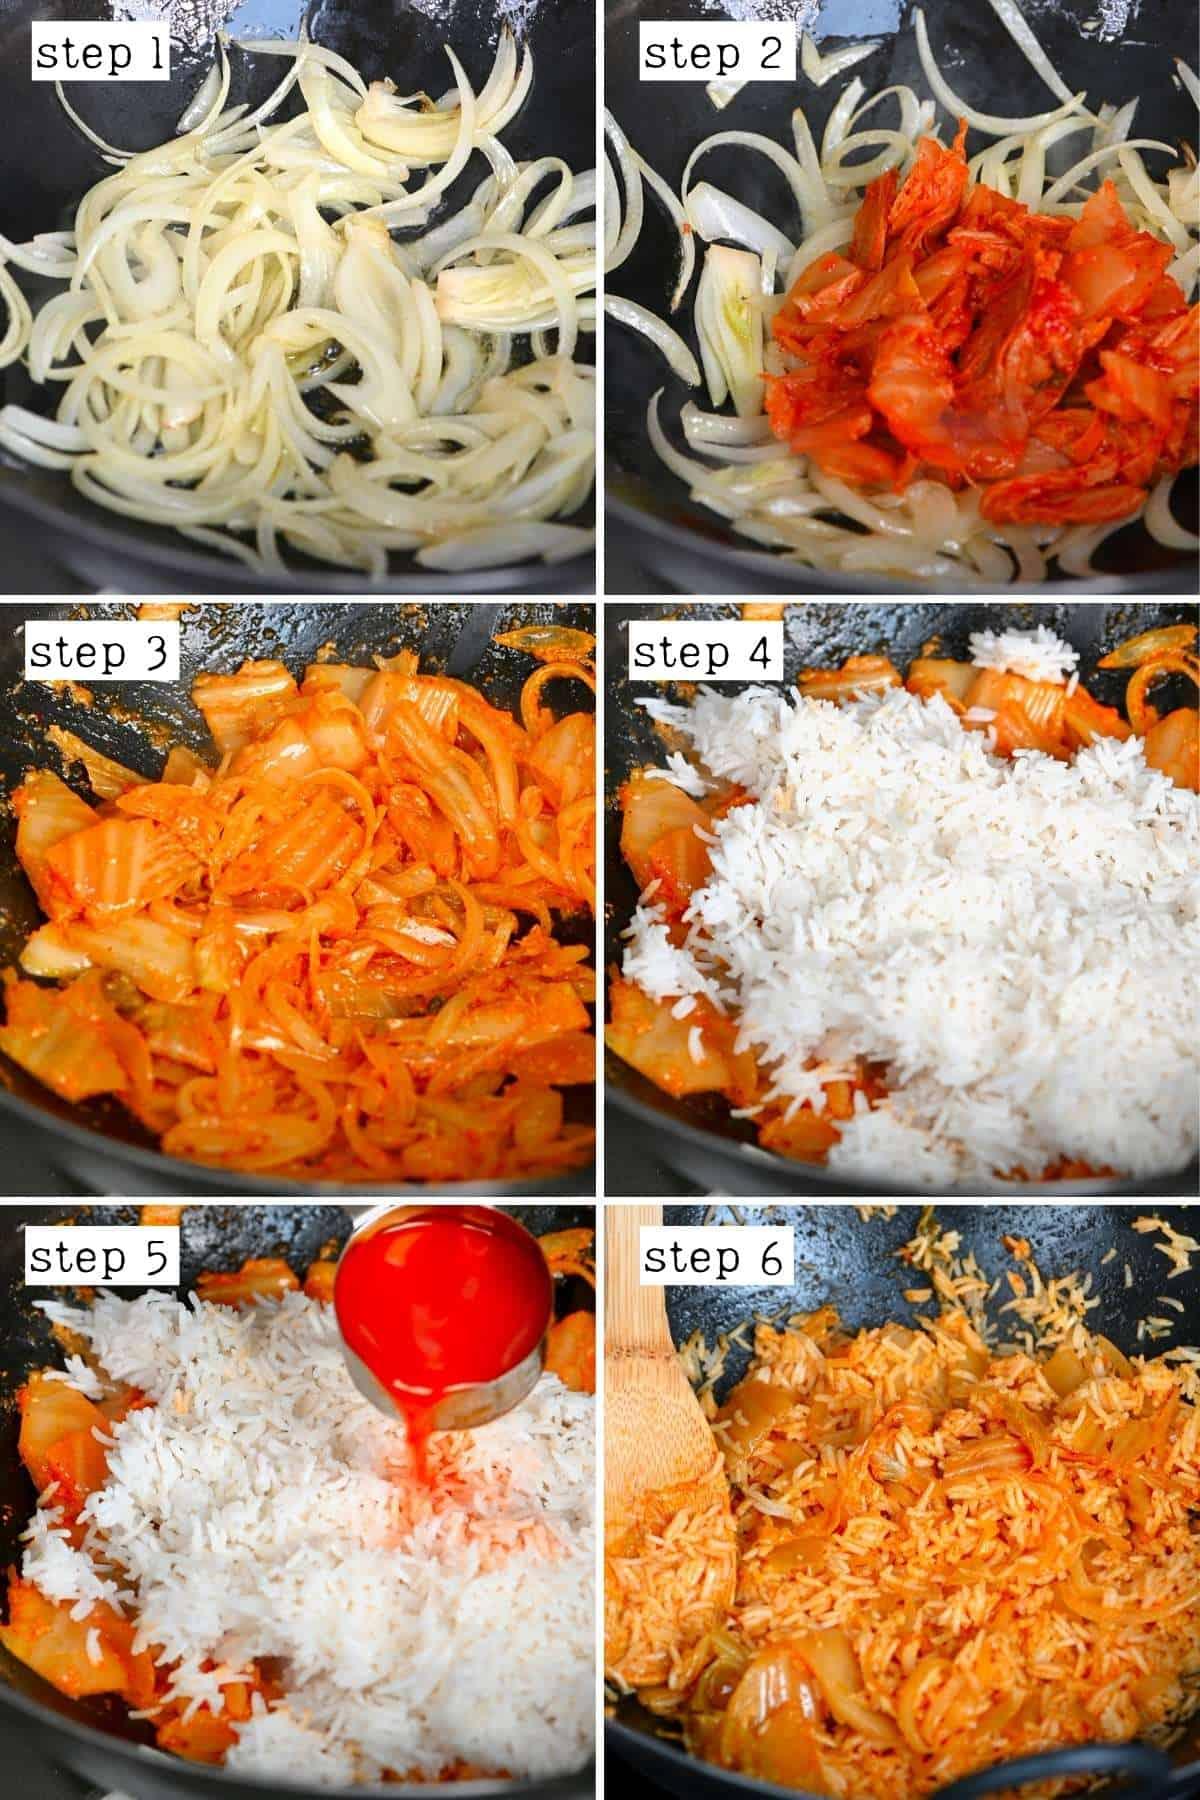 Steps for preparing kimchi rice